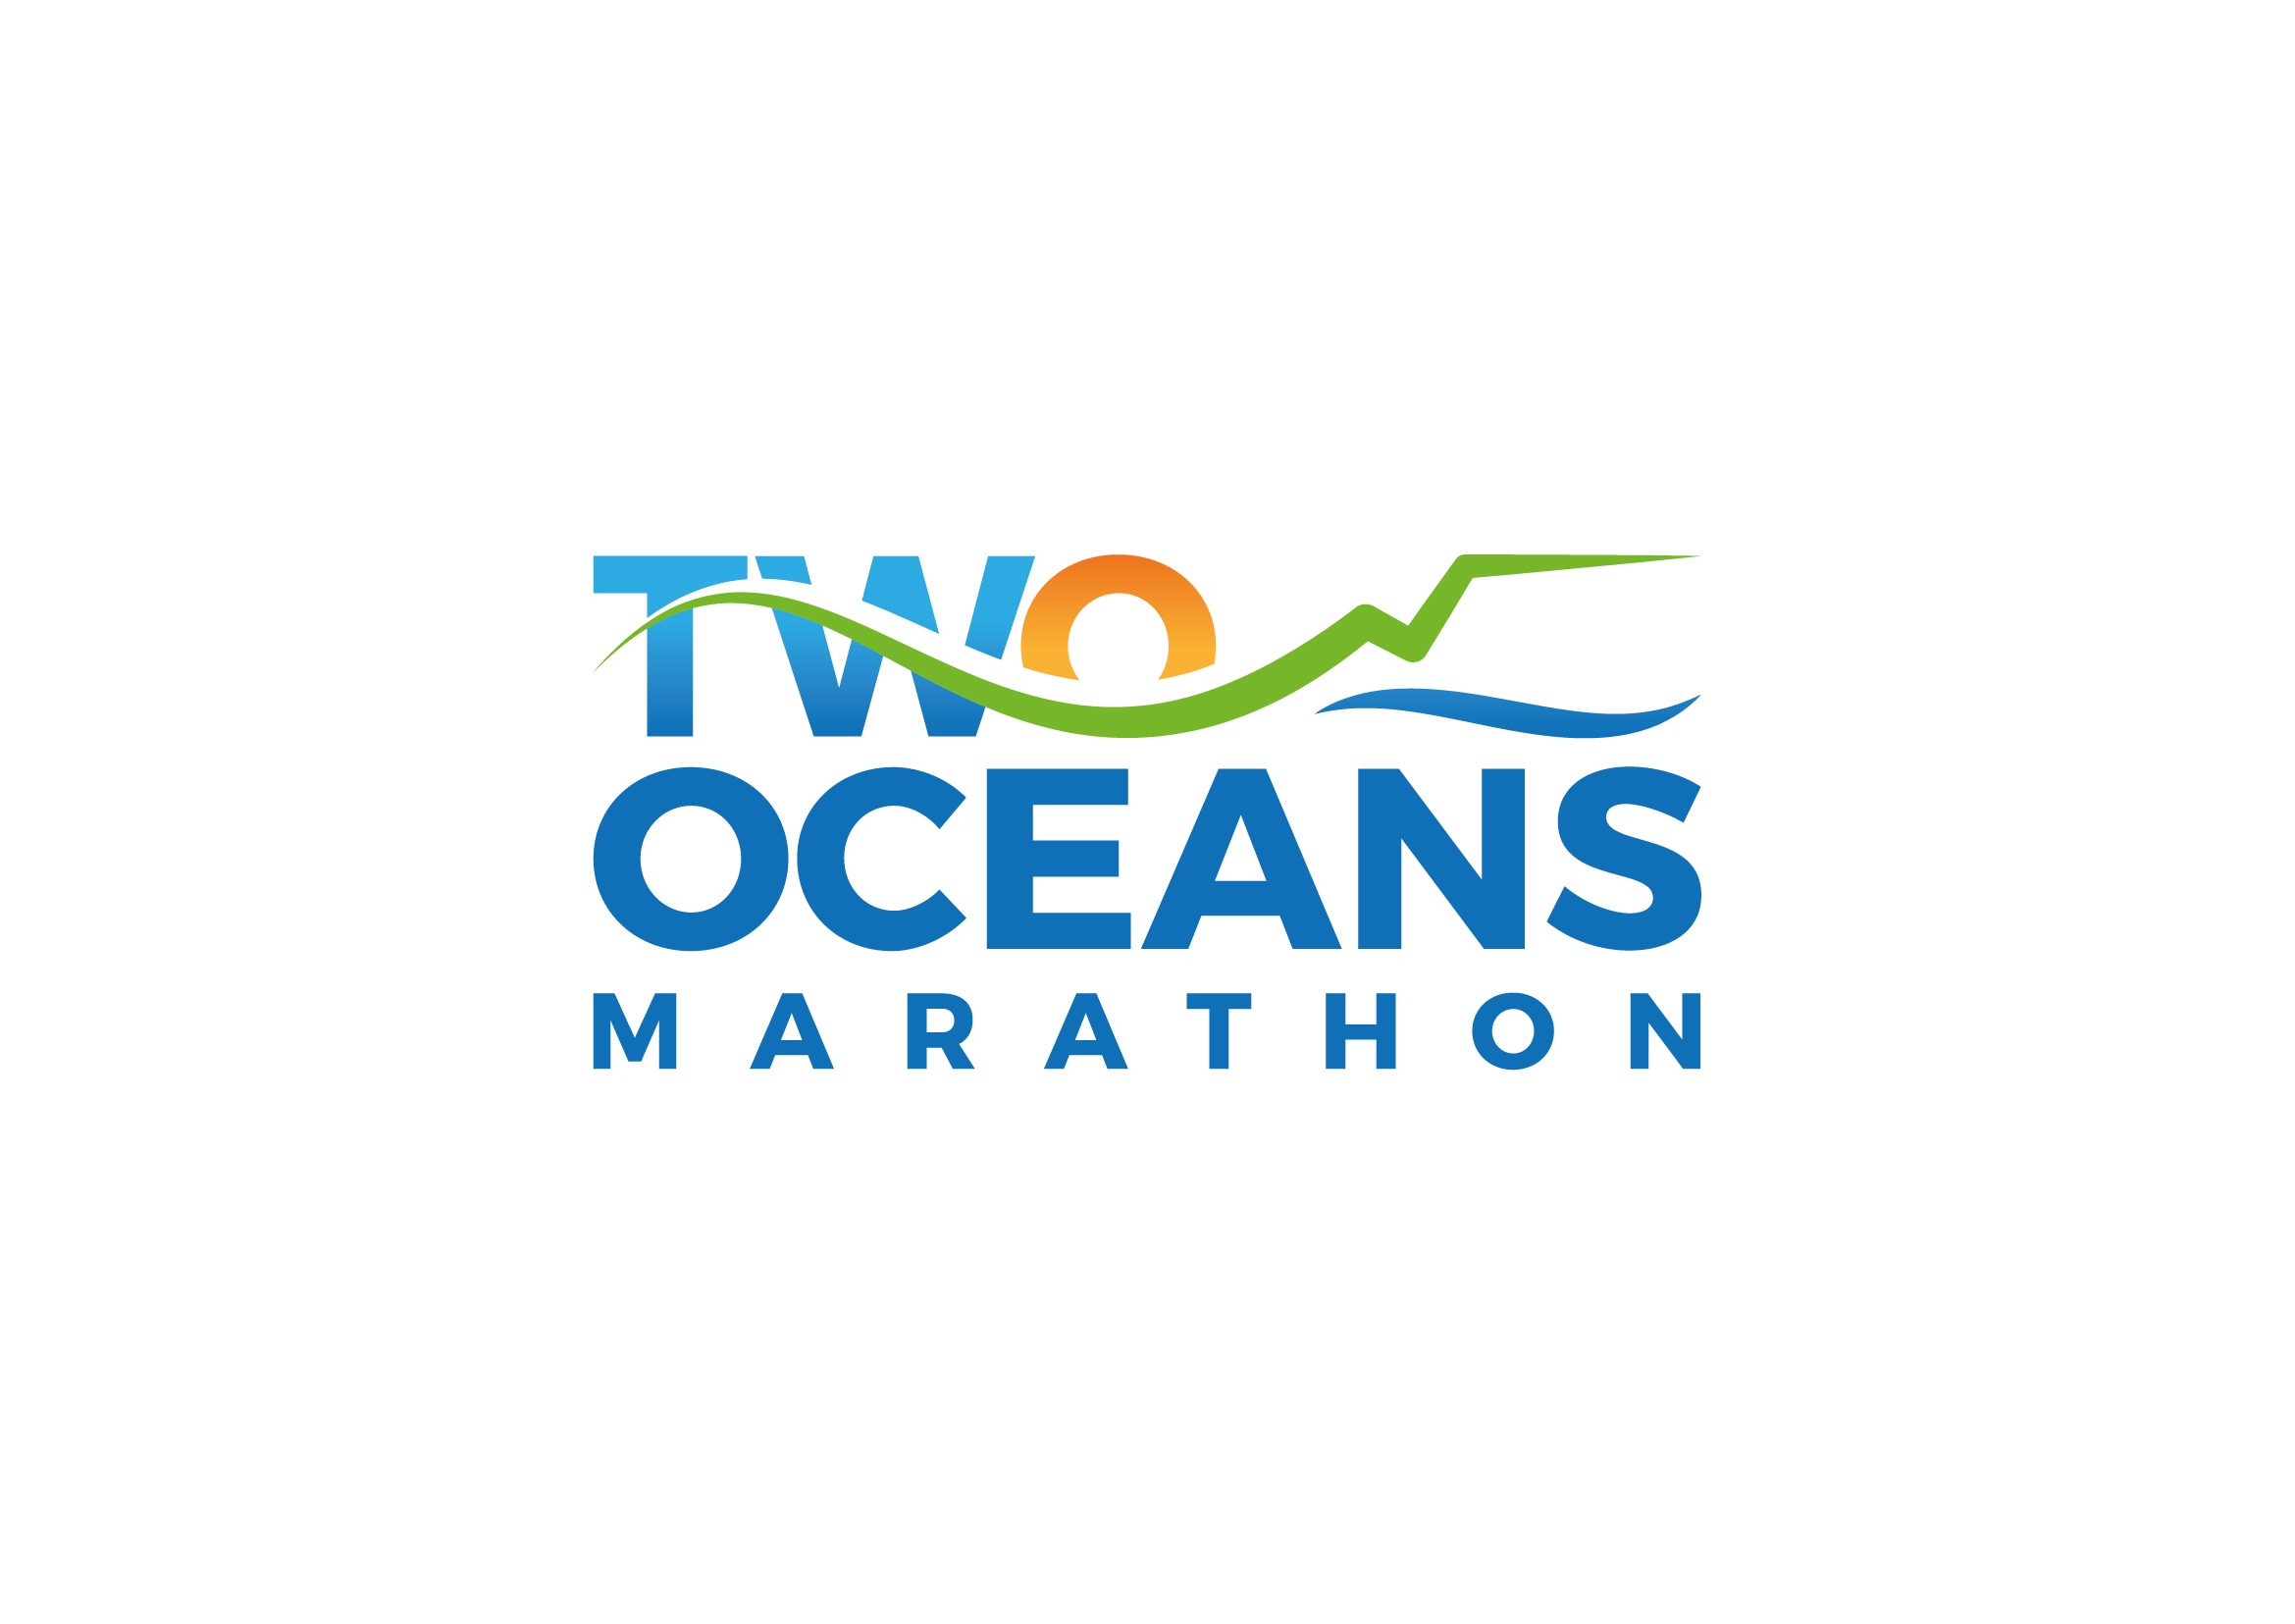 Two Oceans Marathon (TOM) NPC 12th Annual General Meeting (AGM) – Notice